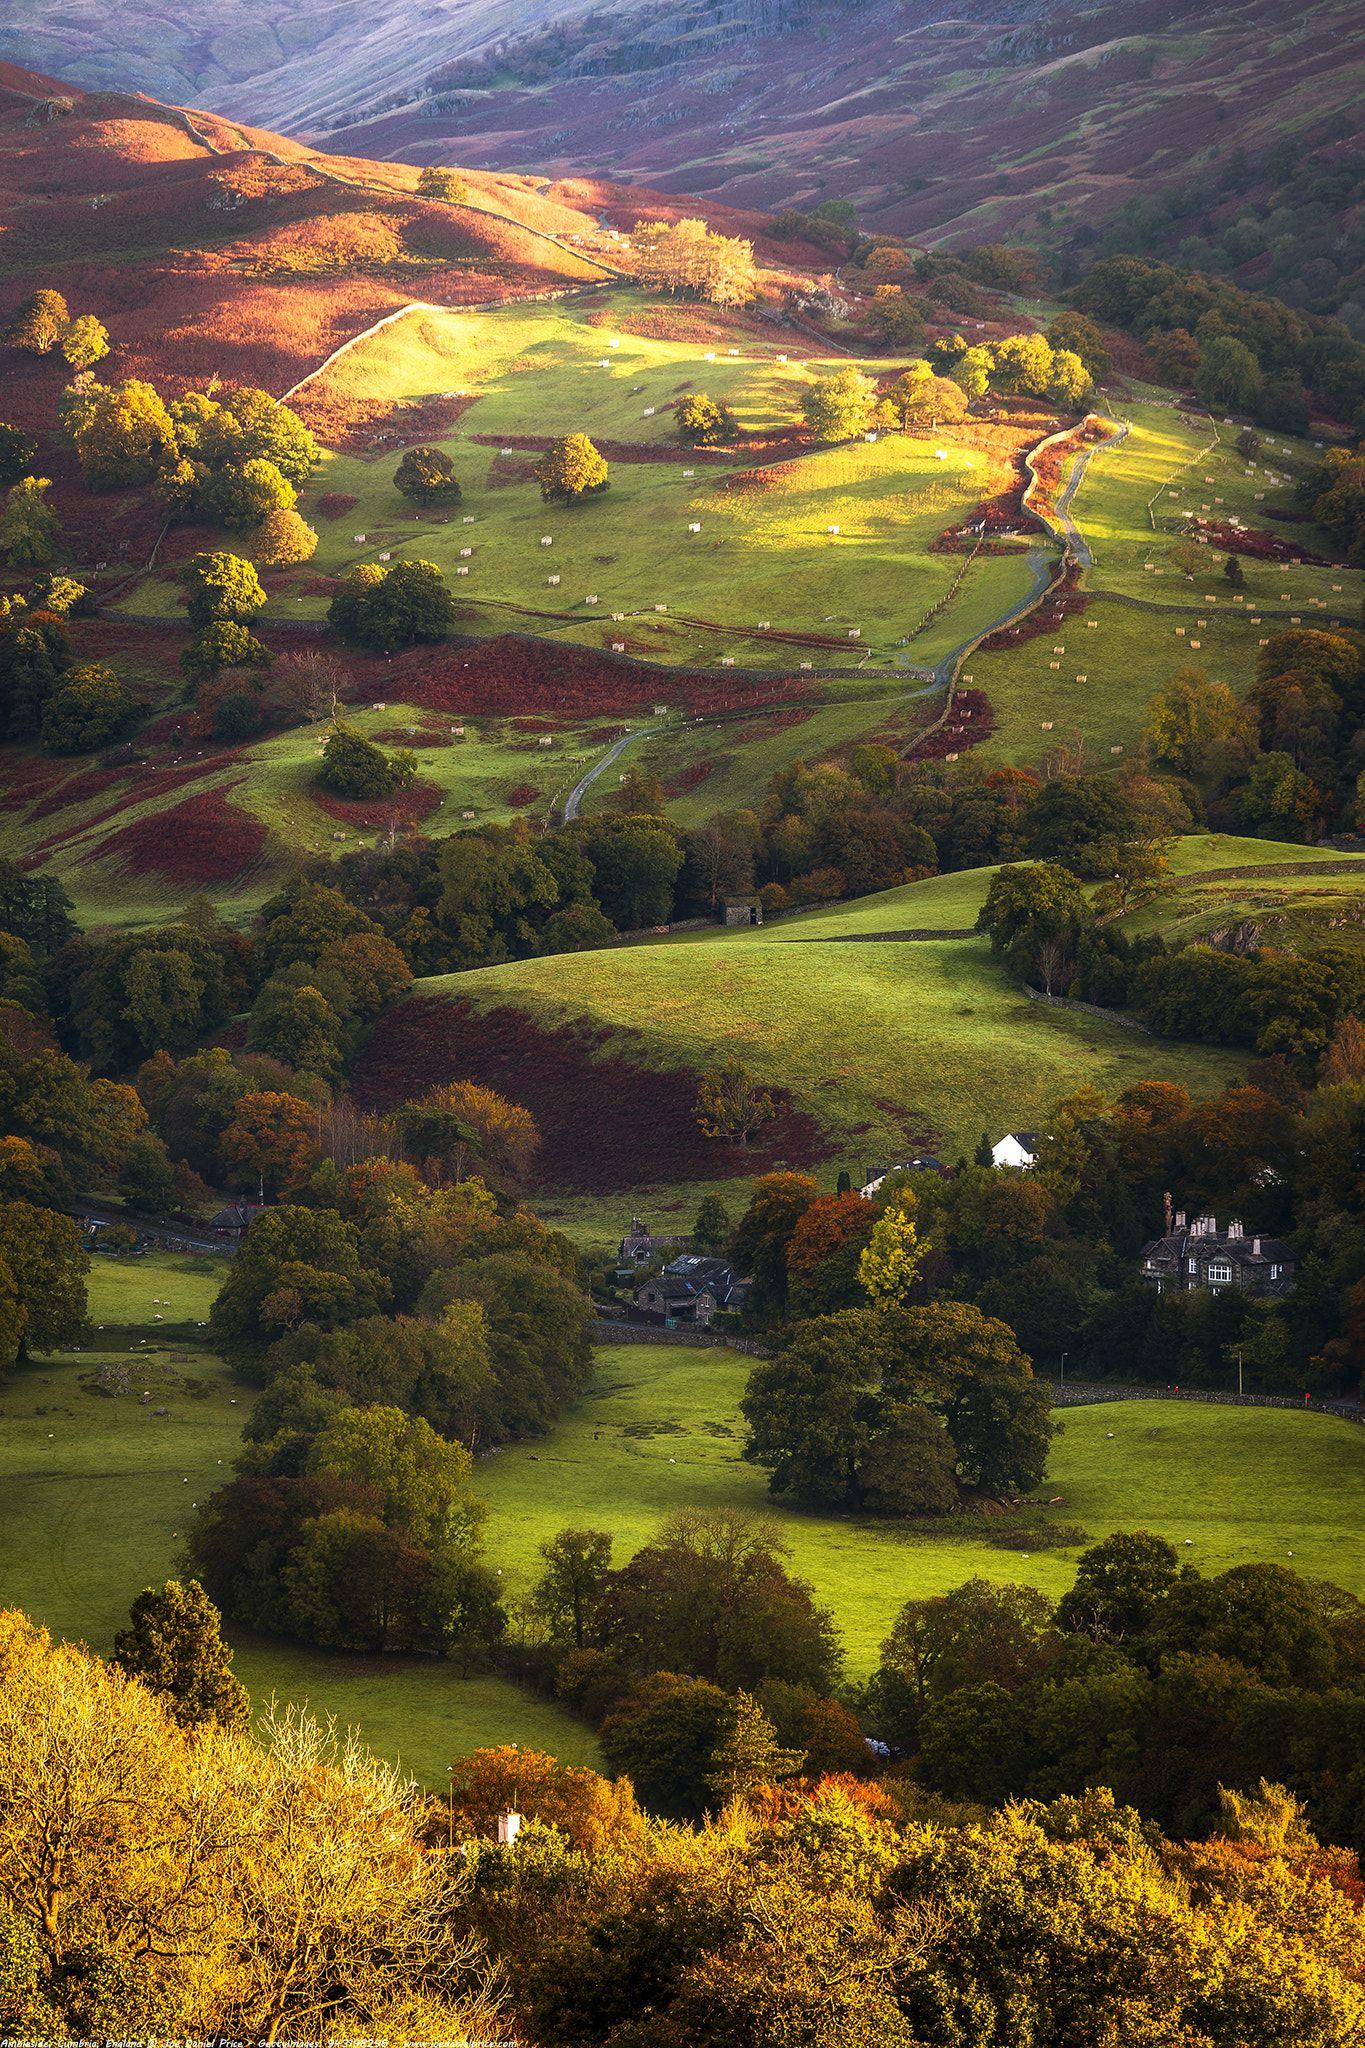 Morning Light At Ambleside Lake District Cumbria England Cool Places To Visit Lake District England Lake District